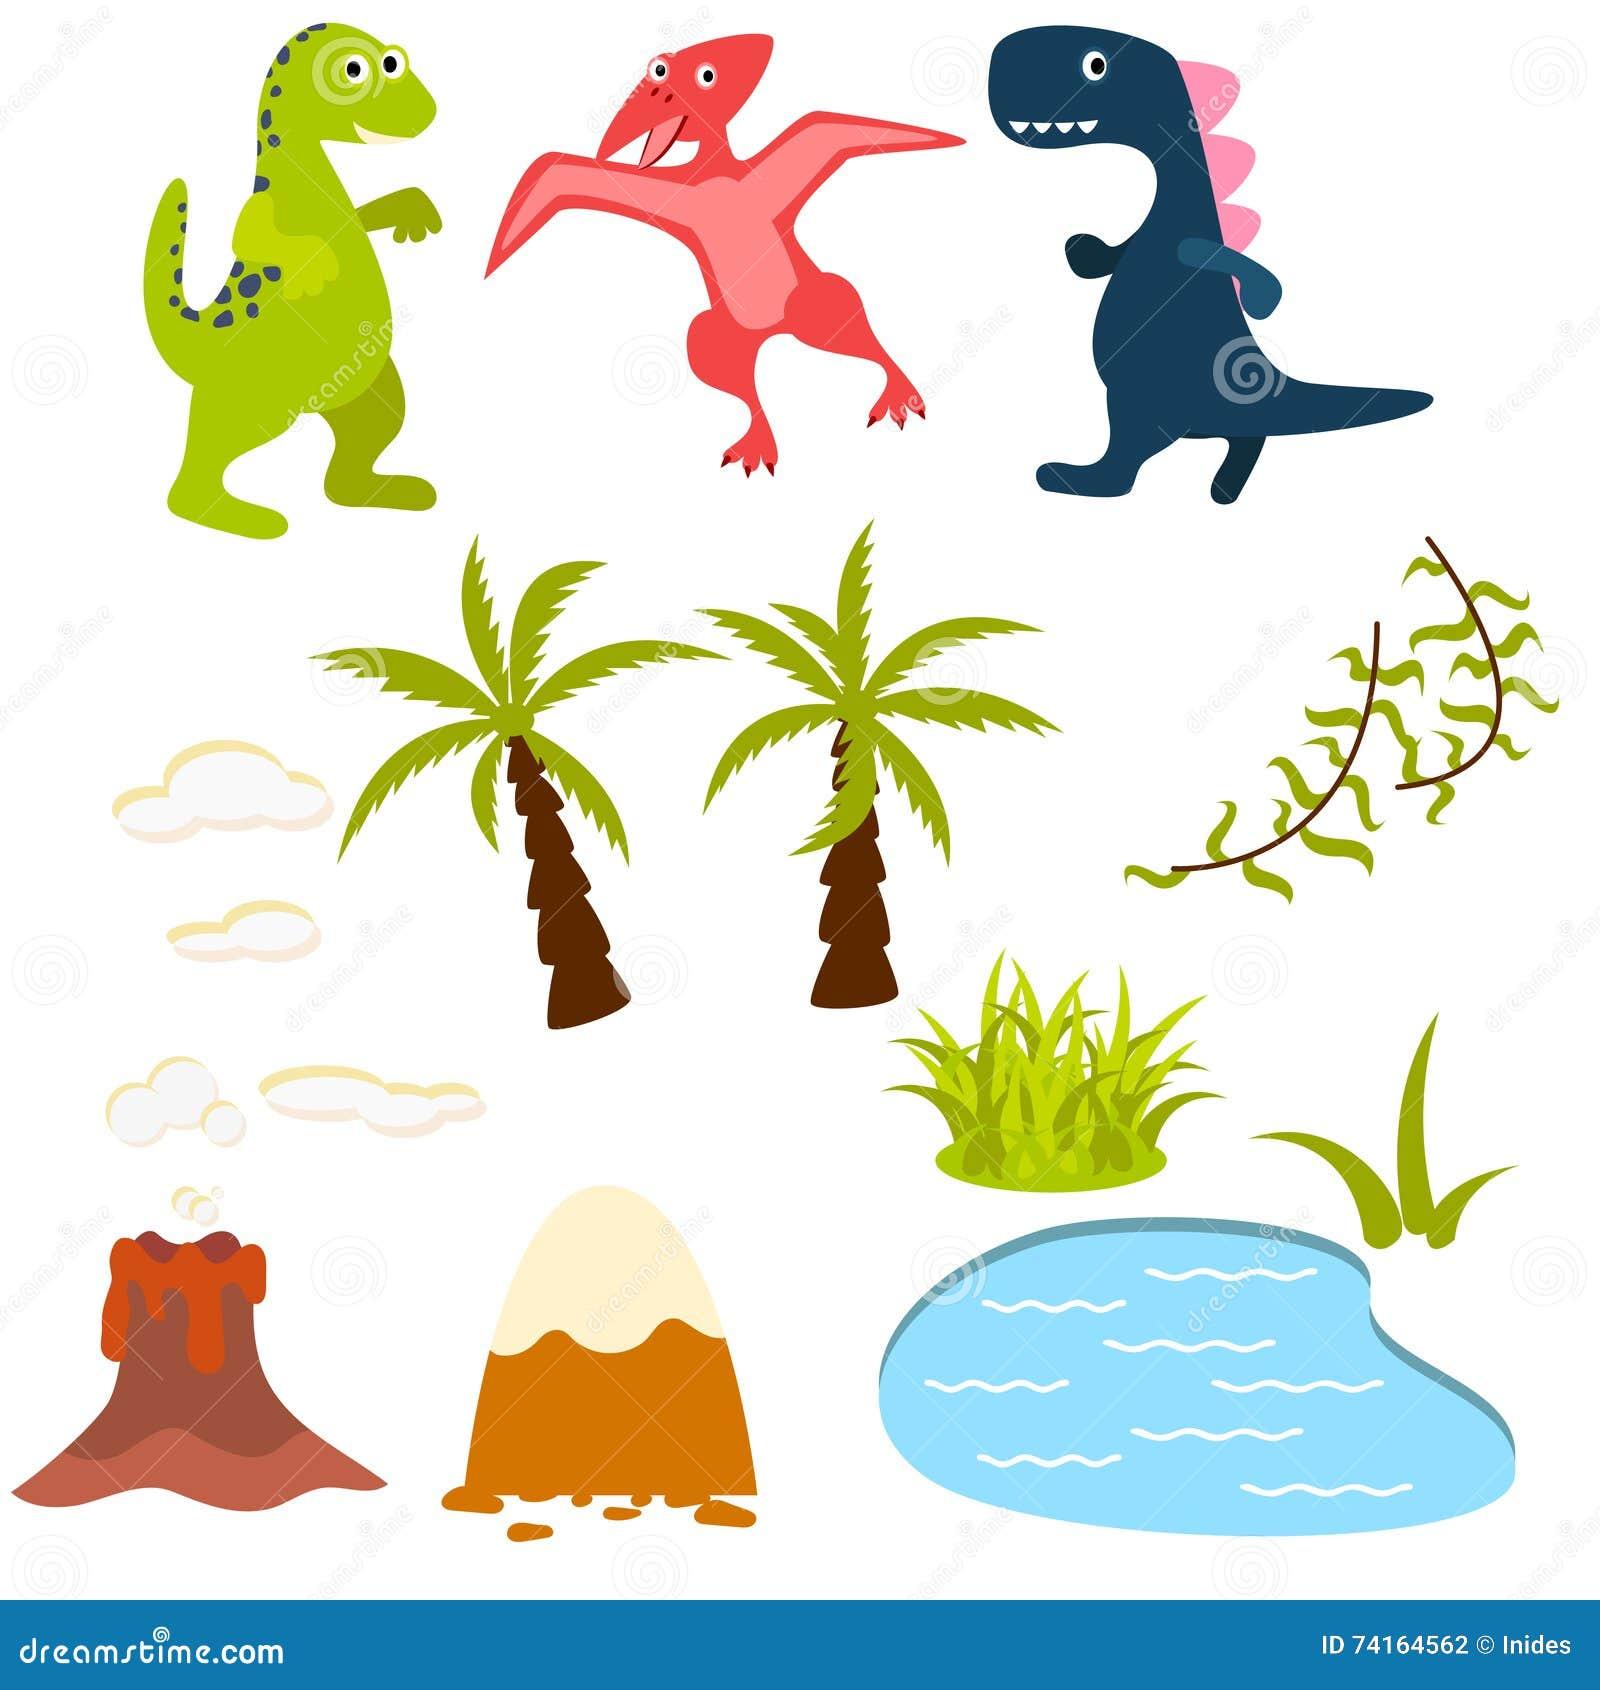 Dinosaur And Jungle Tree Clipart Set. Stock Vector - Image: 71375476